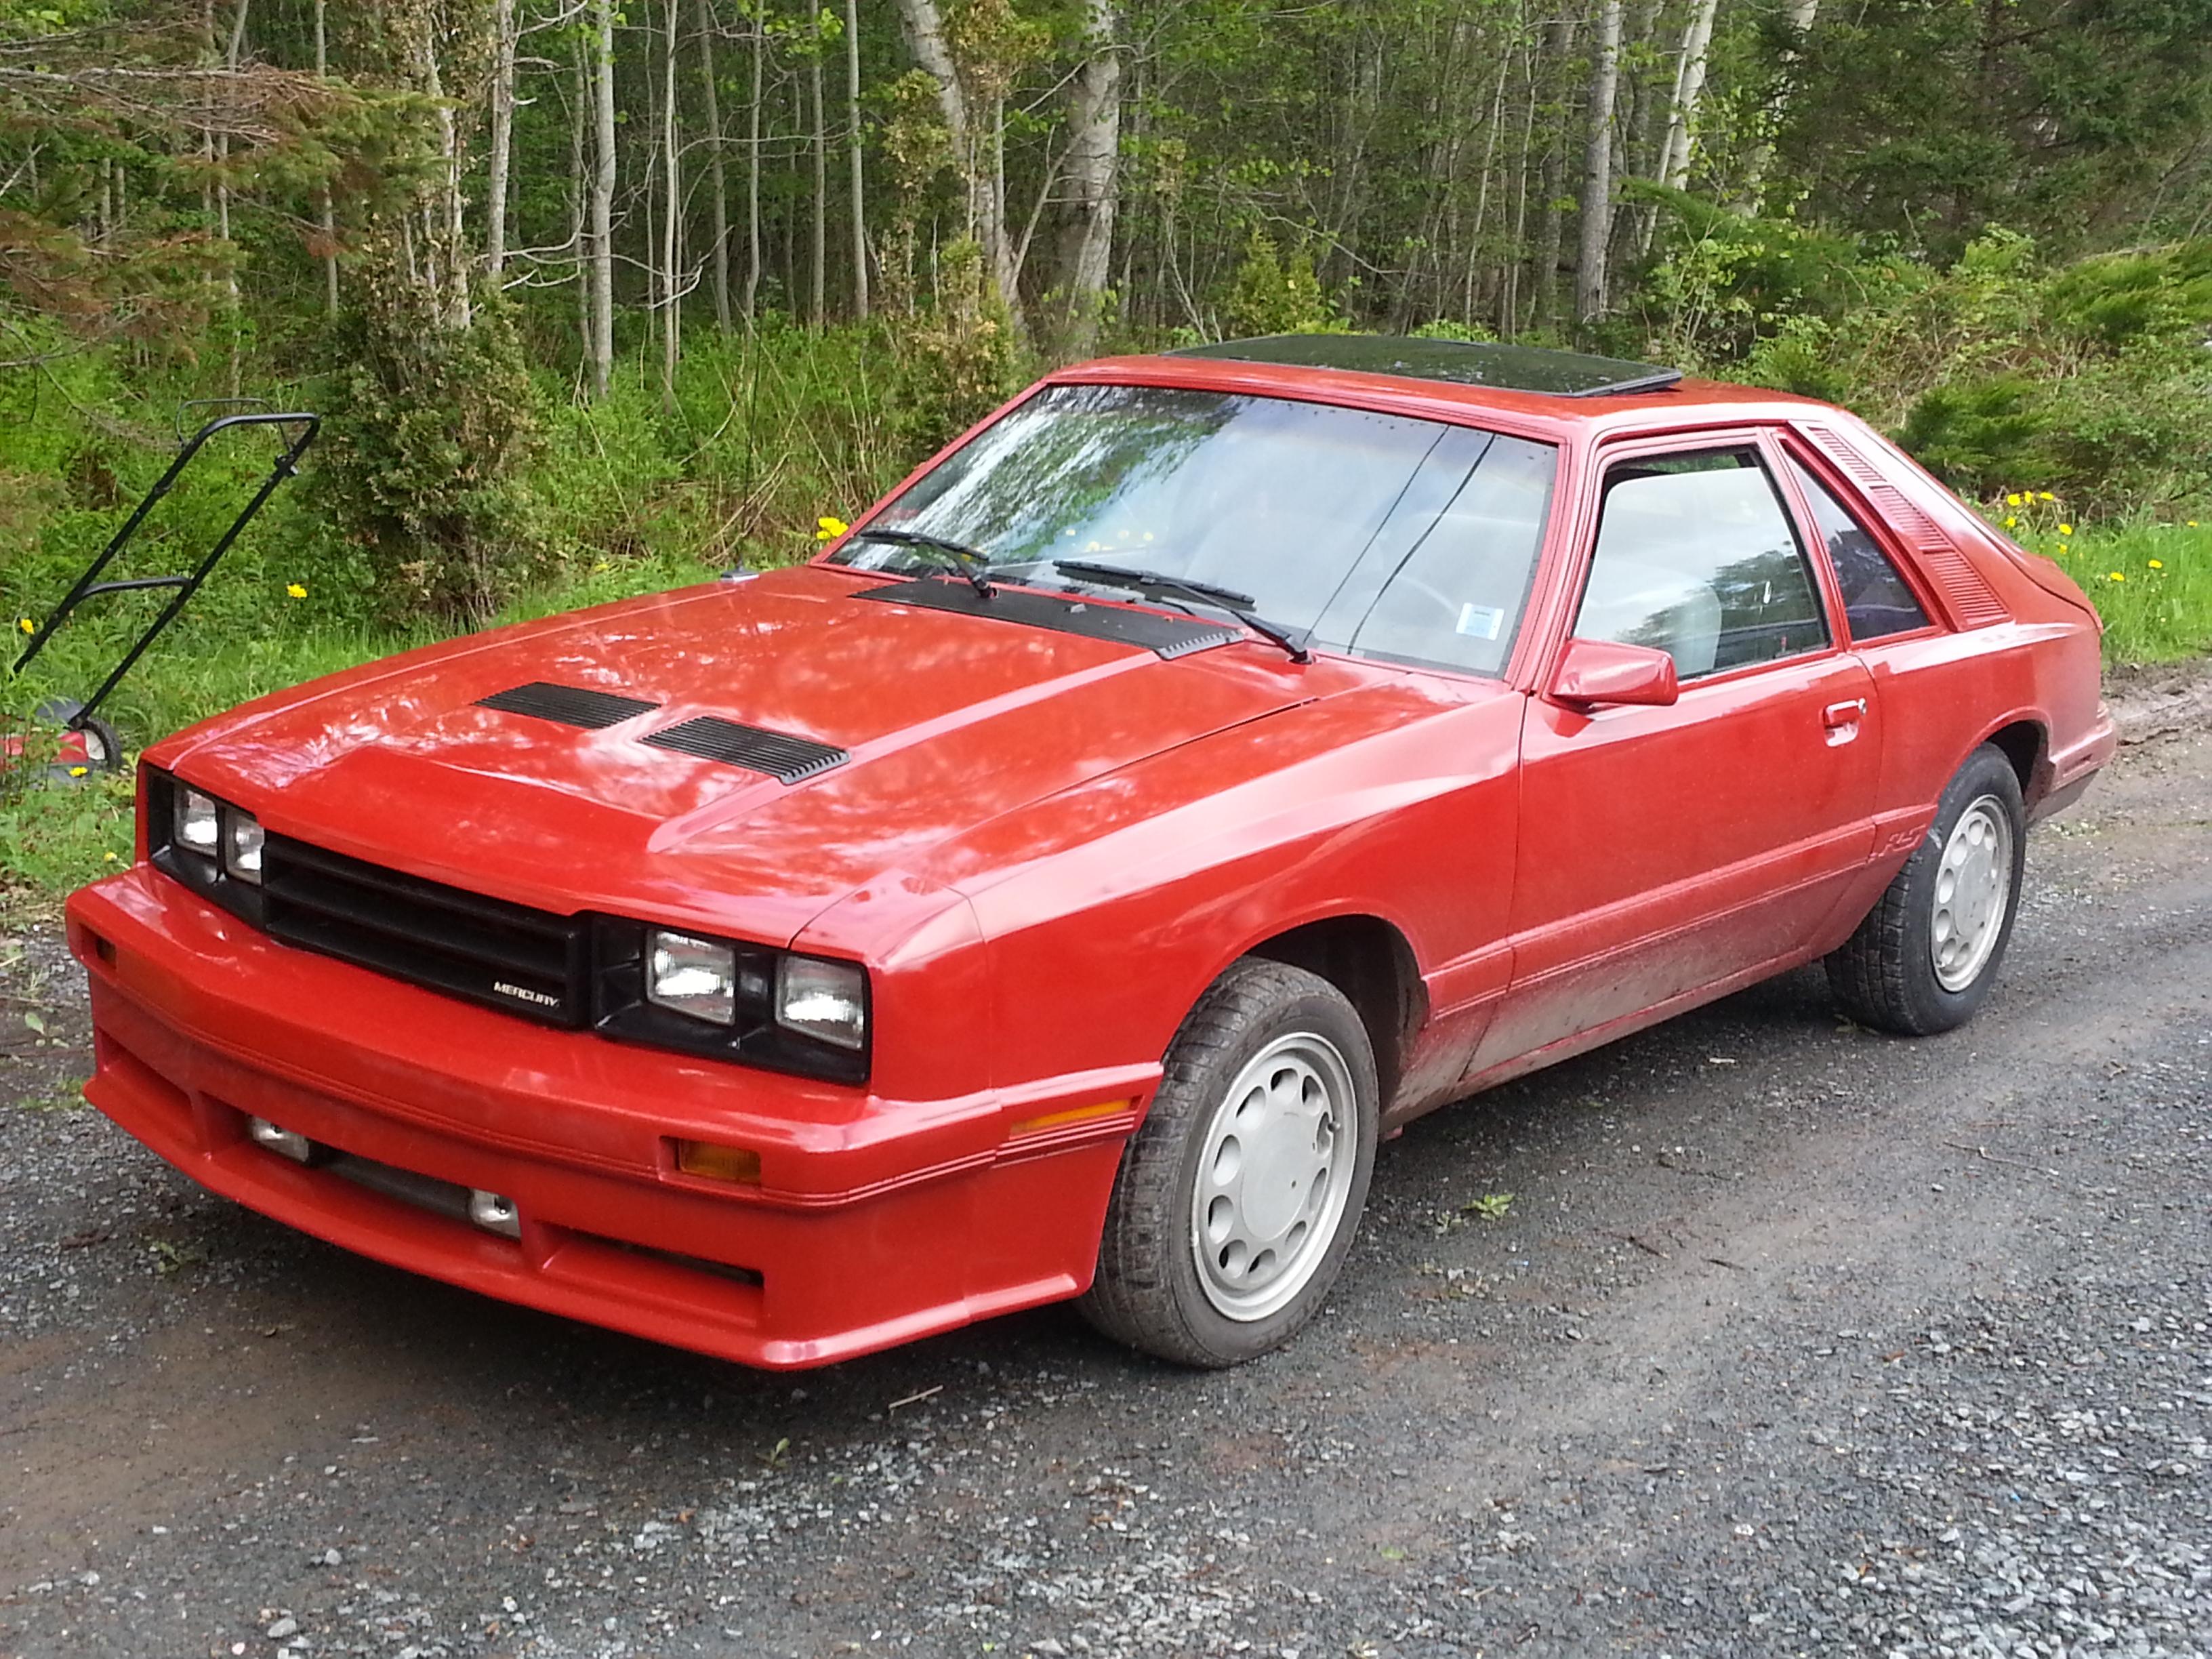 Cohort Classic 1984 1986 Mercury Capri Rs 50 Bubble Back Ford Mustang Gt 5 0 Convertible